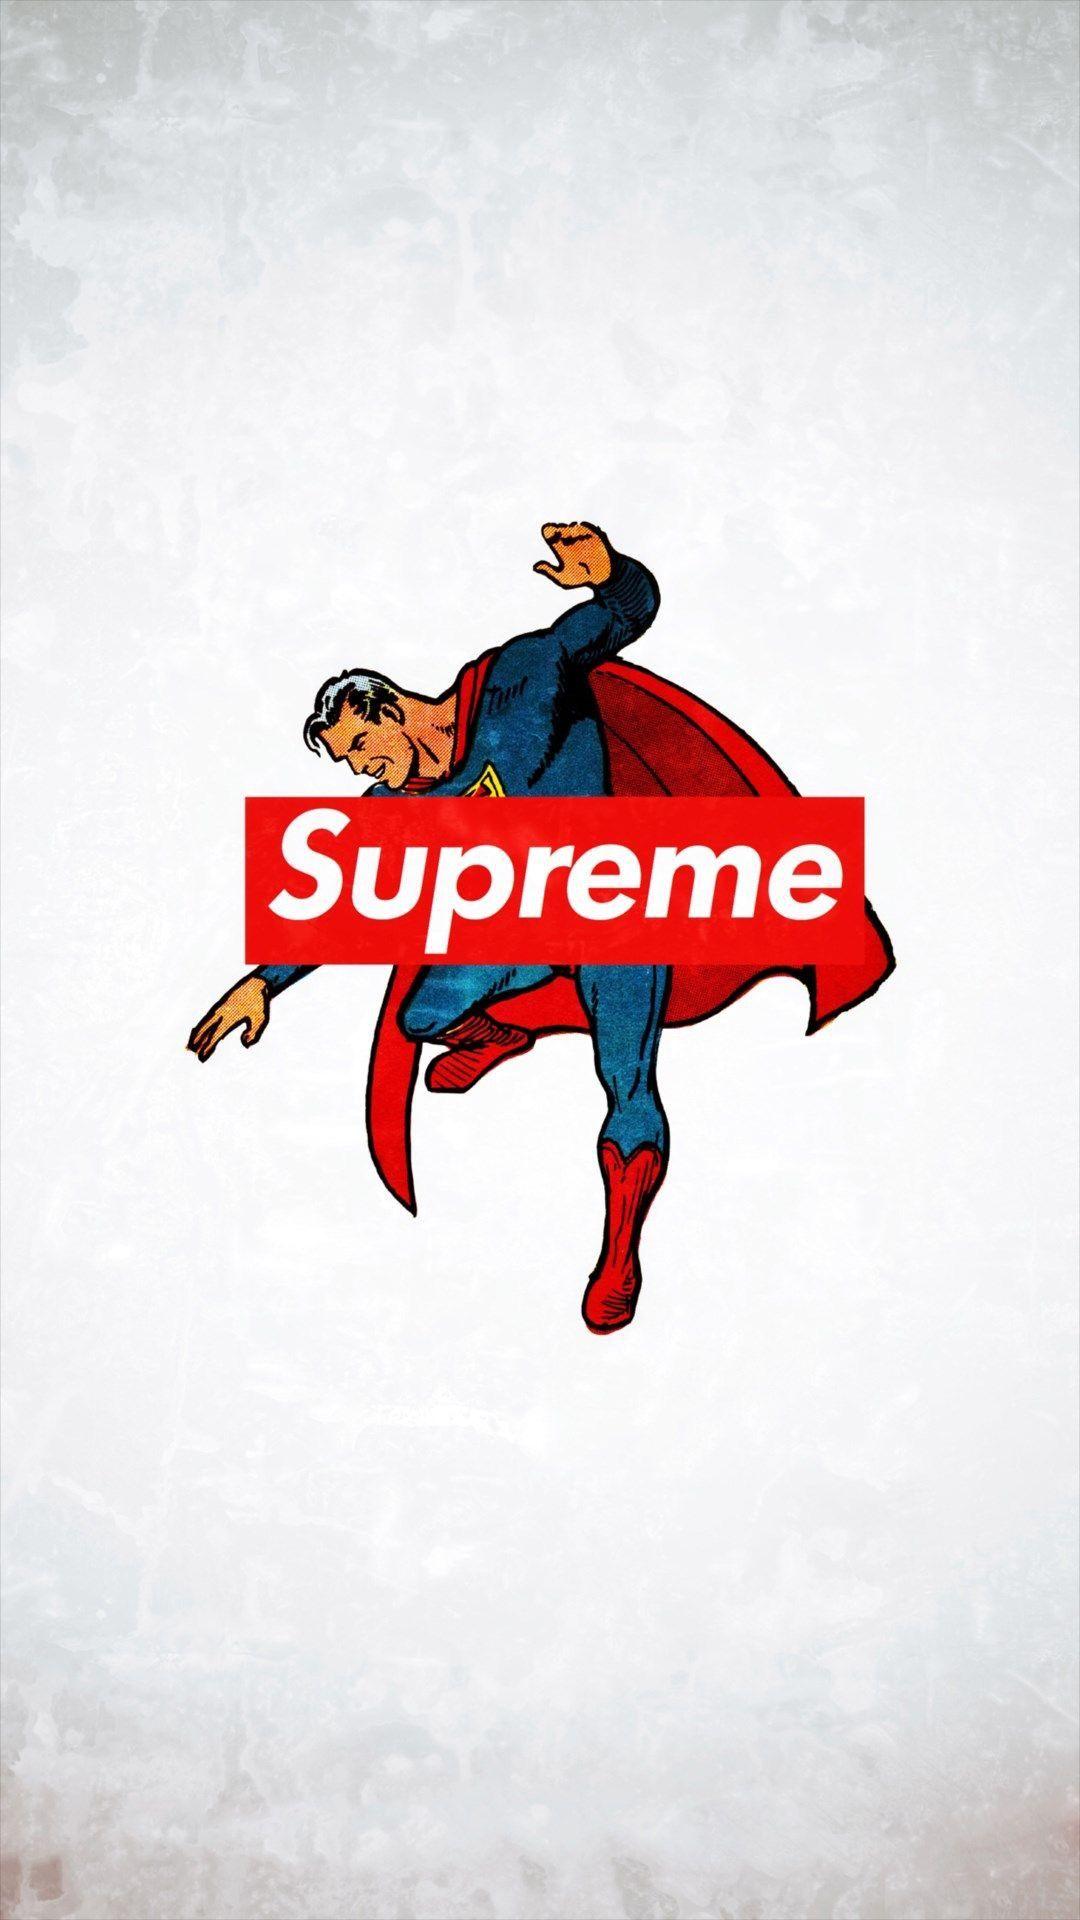 Supreme シュープリーム 60 無料高画質iphone壁紙 最高の壁紙